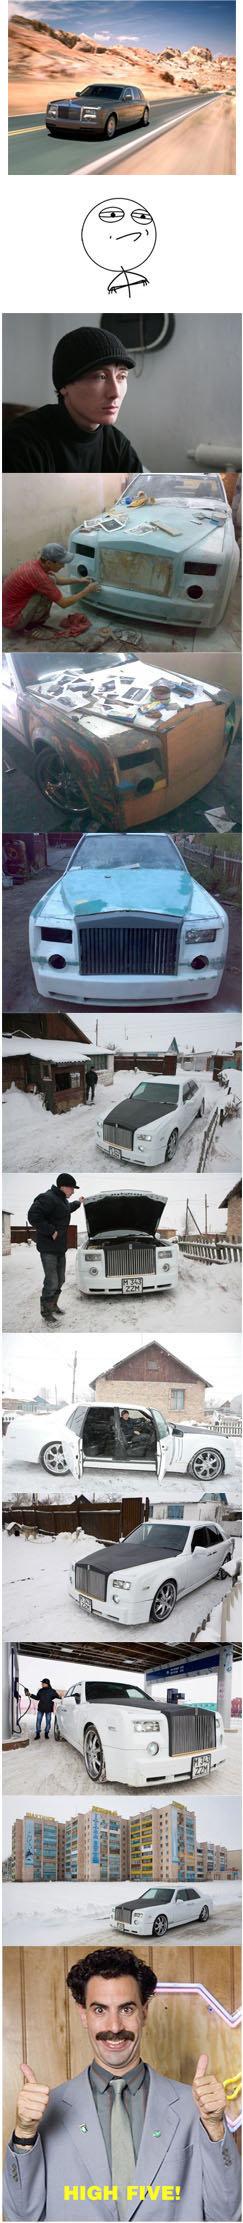 DIY. Rolls Royce Phantom. Rolls-Royce Phantom by Ruslan Mukanov(Shahtinsk, Kazakhstan) Overall expenditures: $3 000. diy car handmade